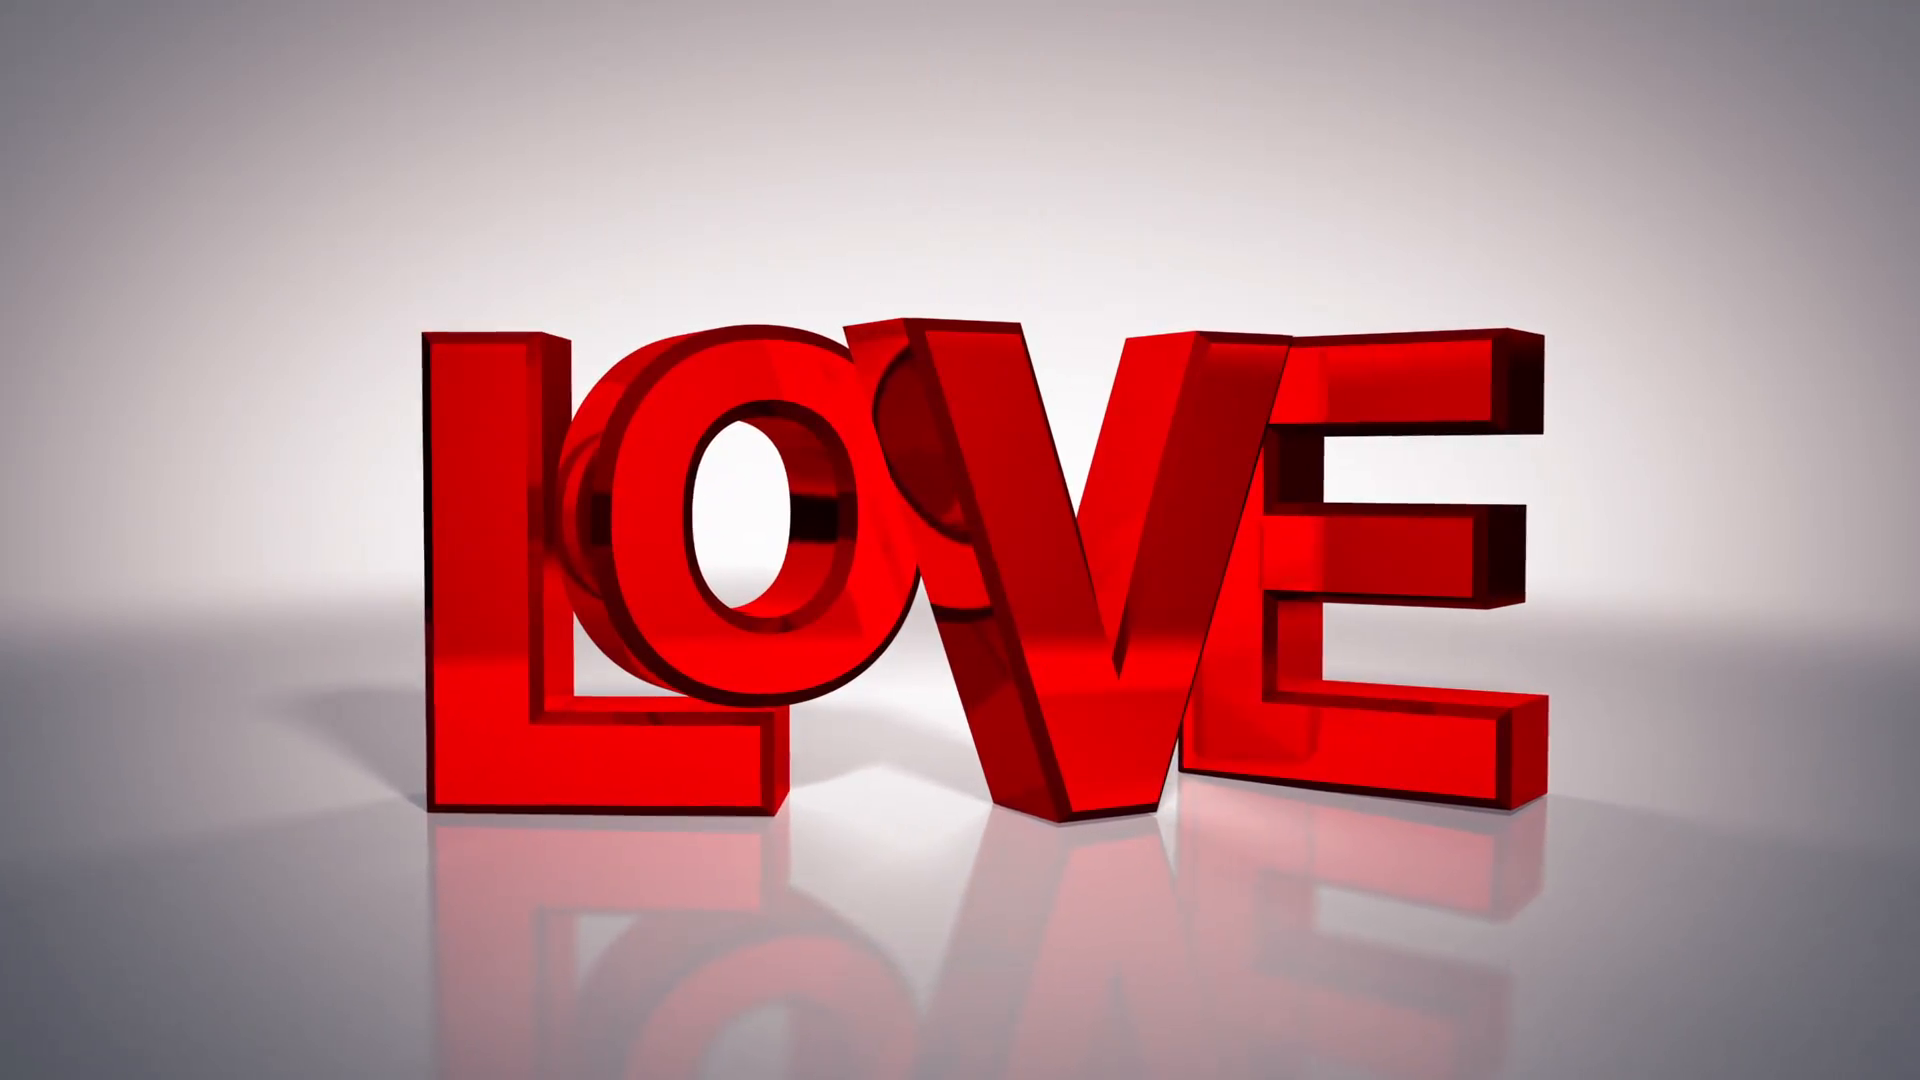 Love 3D Text Graphic Motion Background - Videoblocks